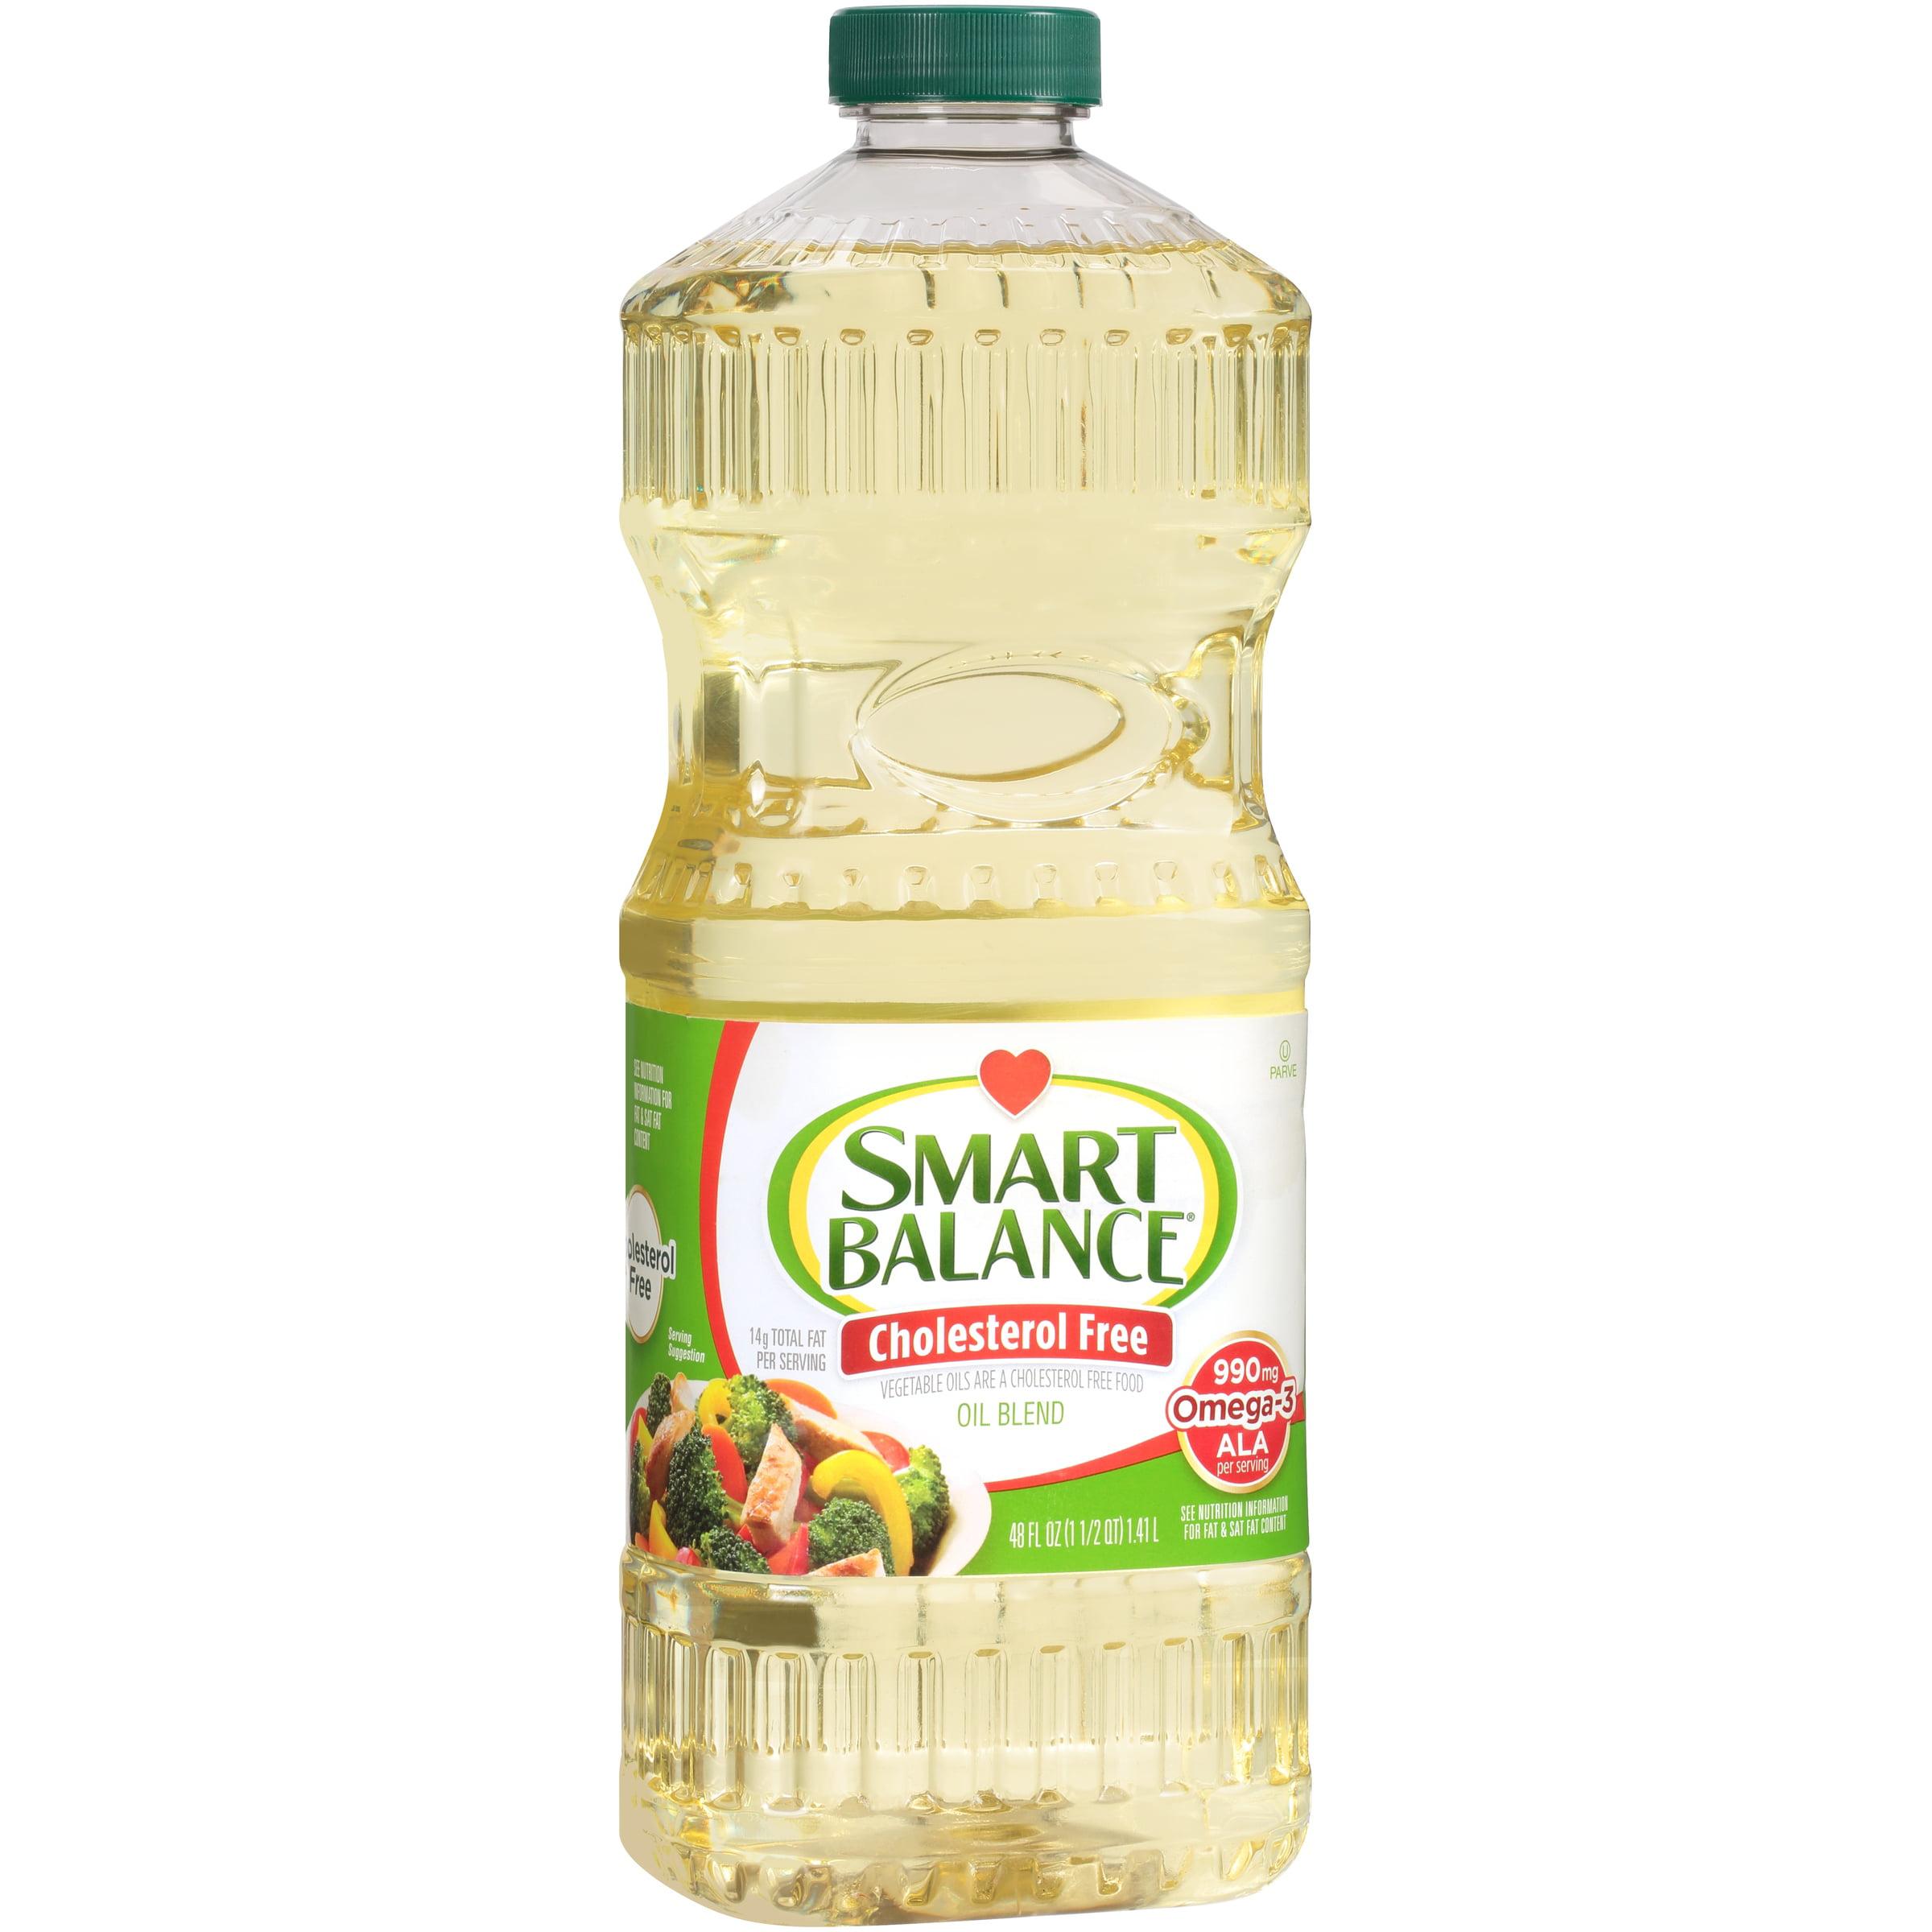 Smart Balance® Vegetable Oil 48 fl. oz. Bottle - Walmart.com